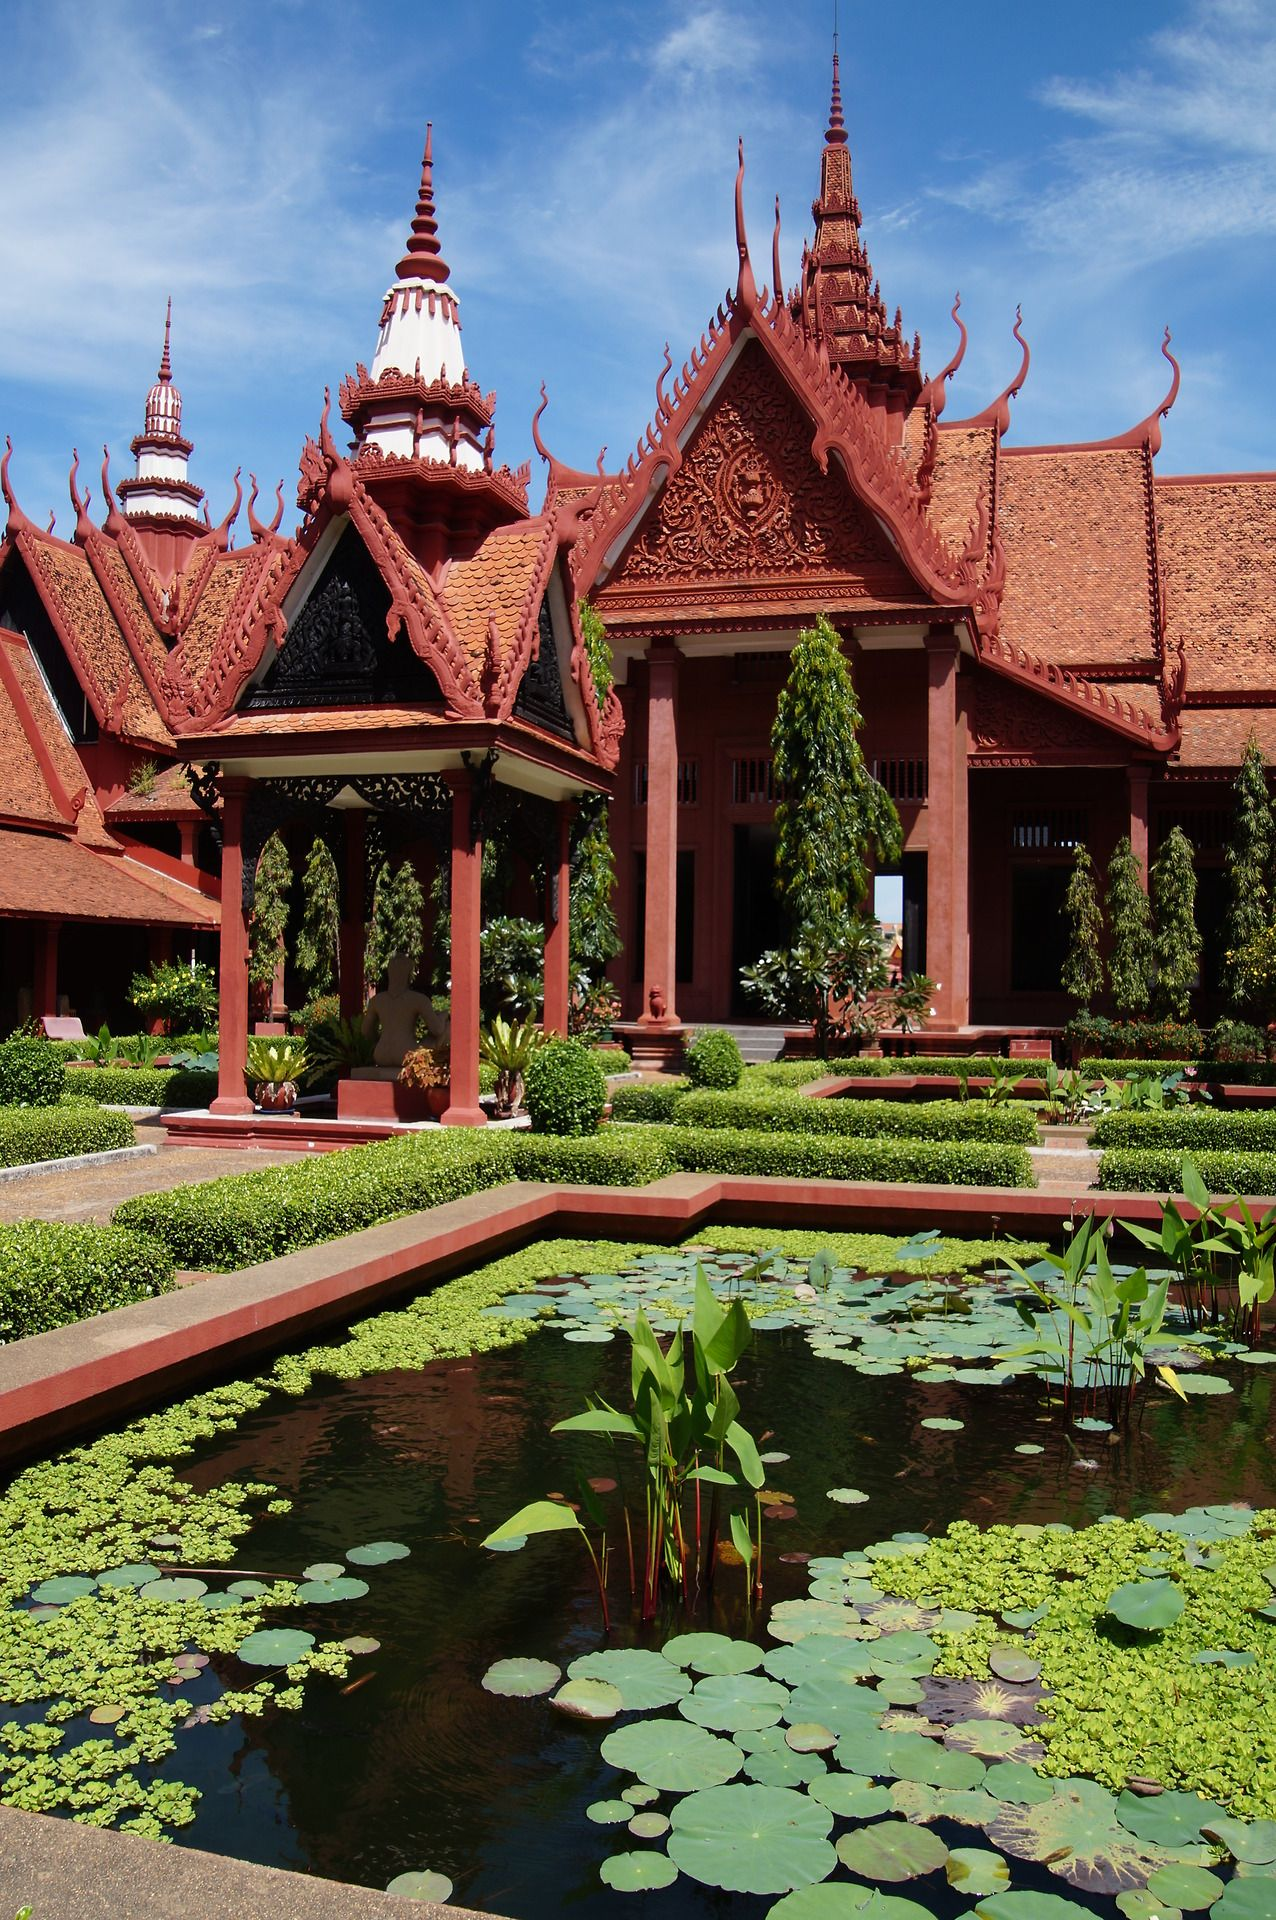 alongwayforrice:  National Museum of Cambodia, Phnom Penh